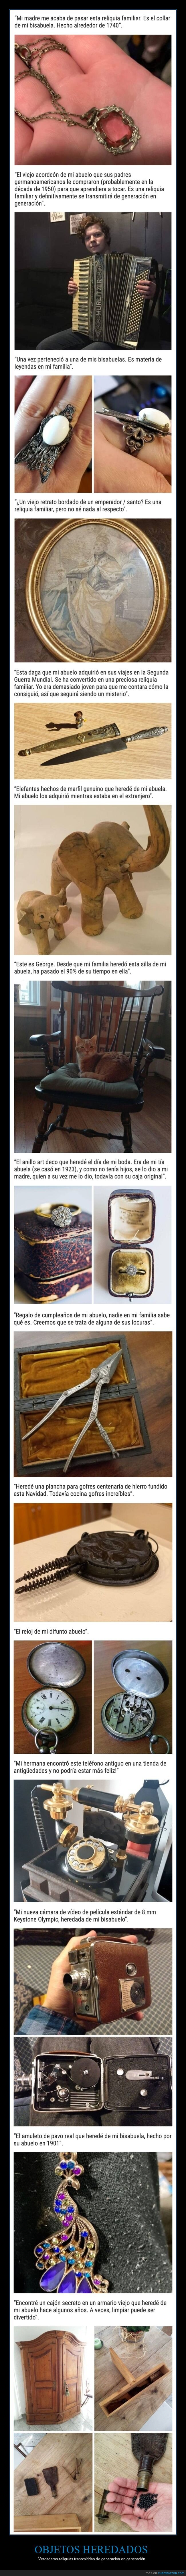 familia,herencias,objetos